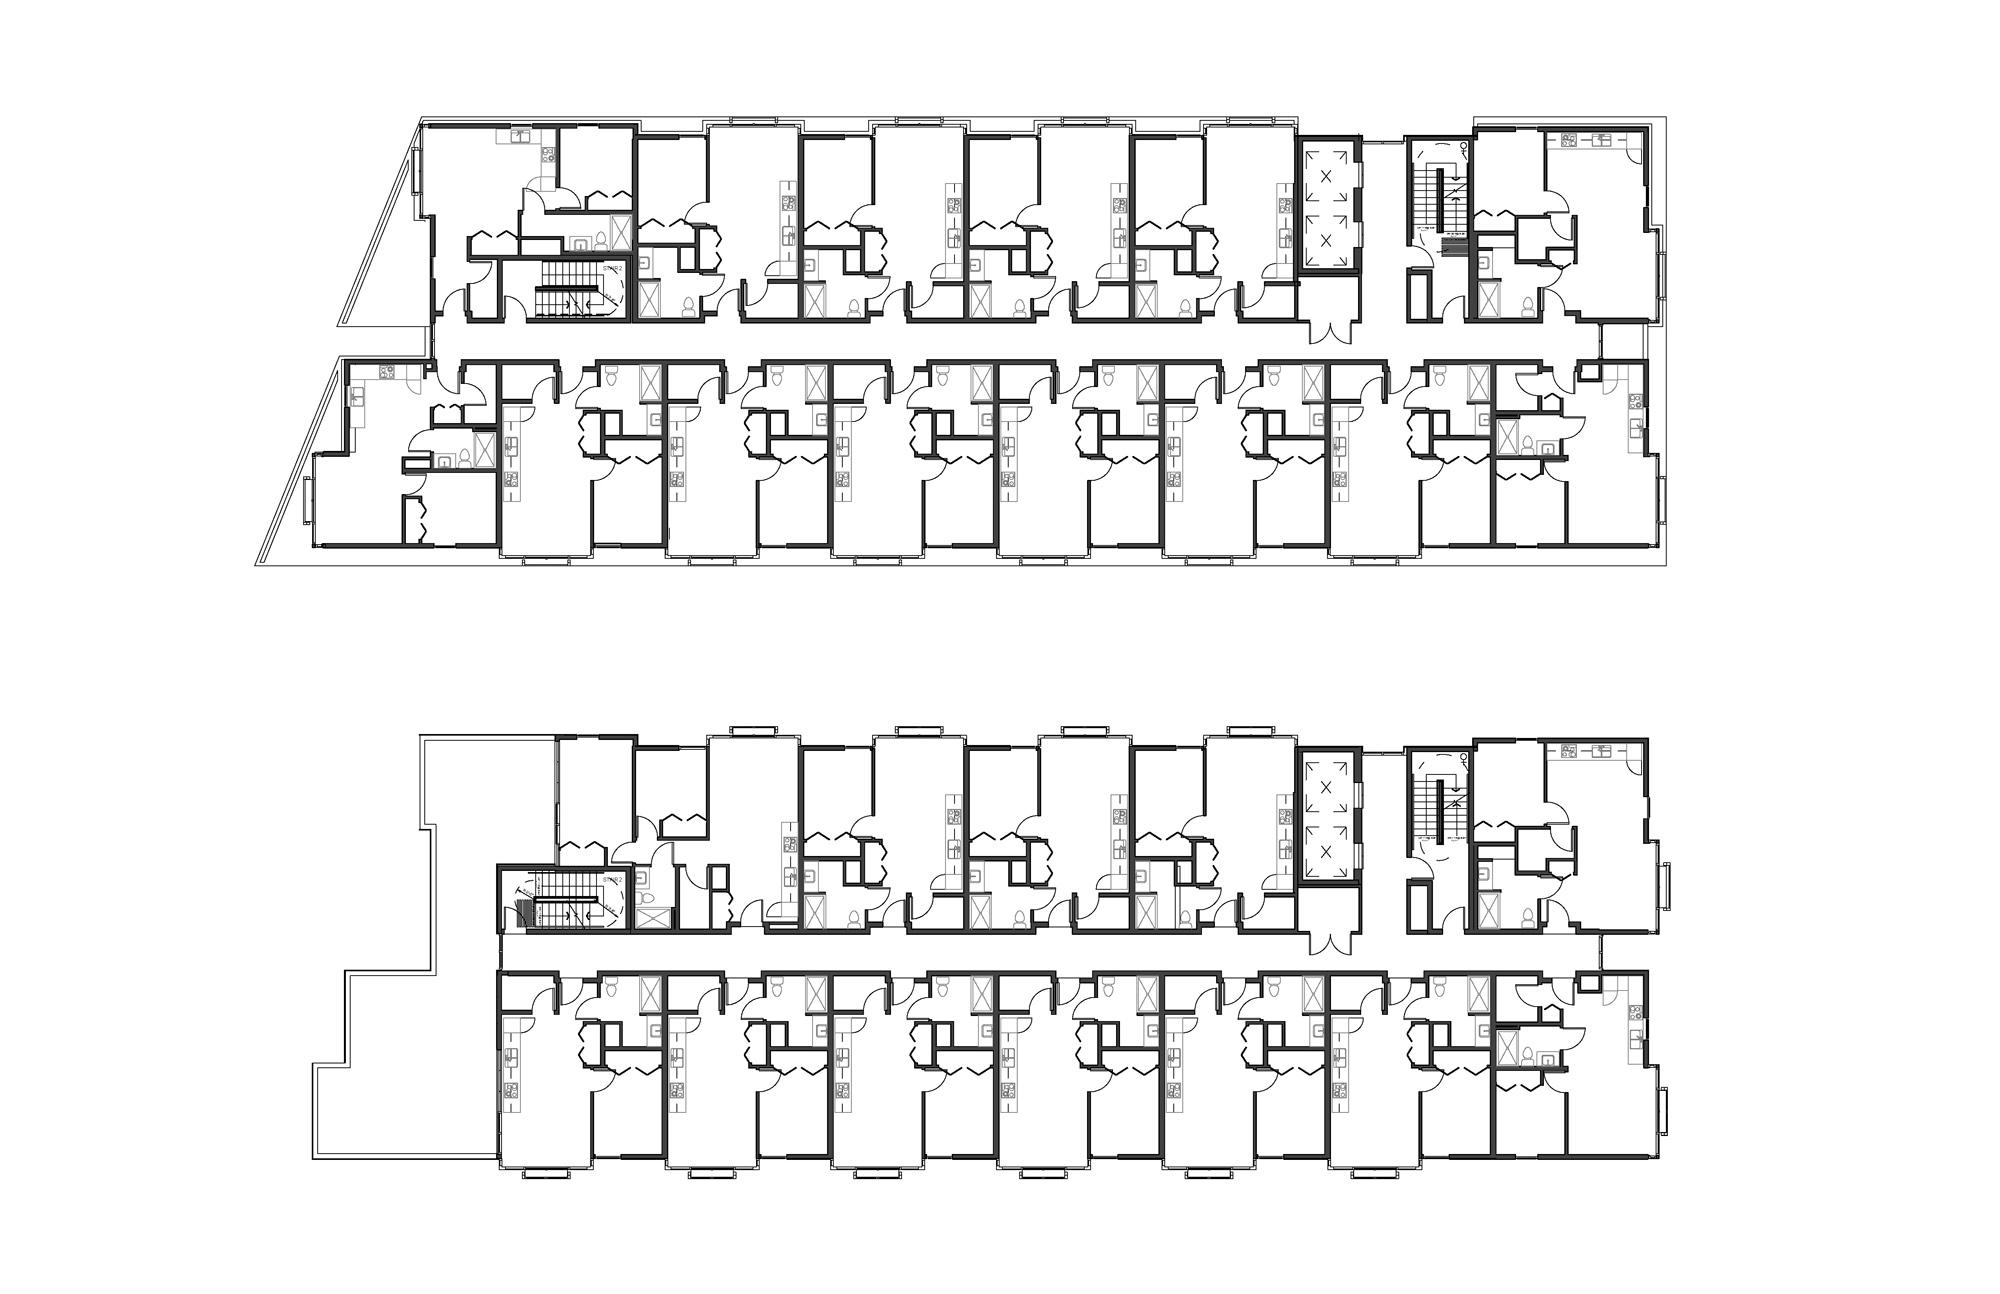 A10-2 - PRESENTATION - LEVEL 2 AND 4_WEB.jpg